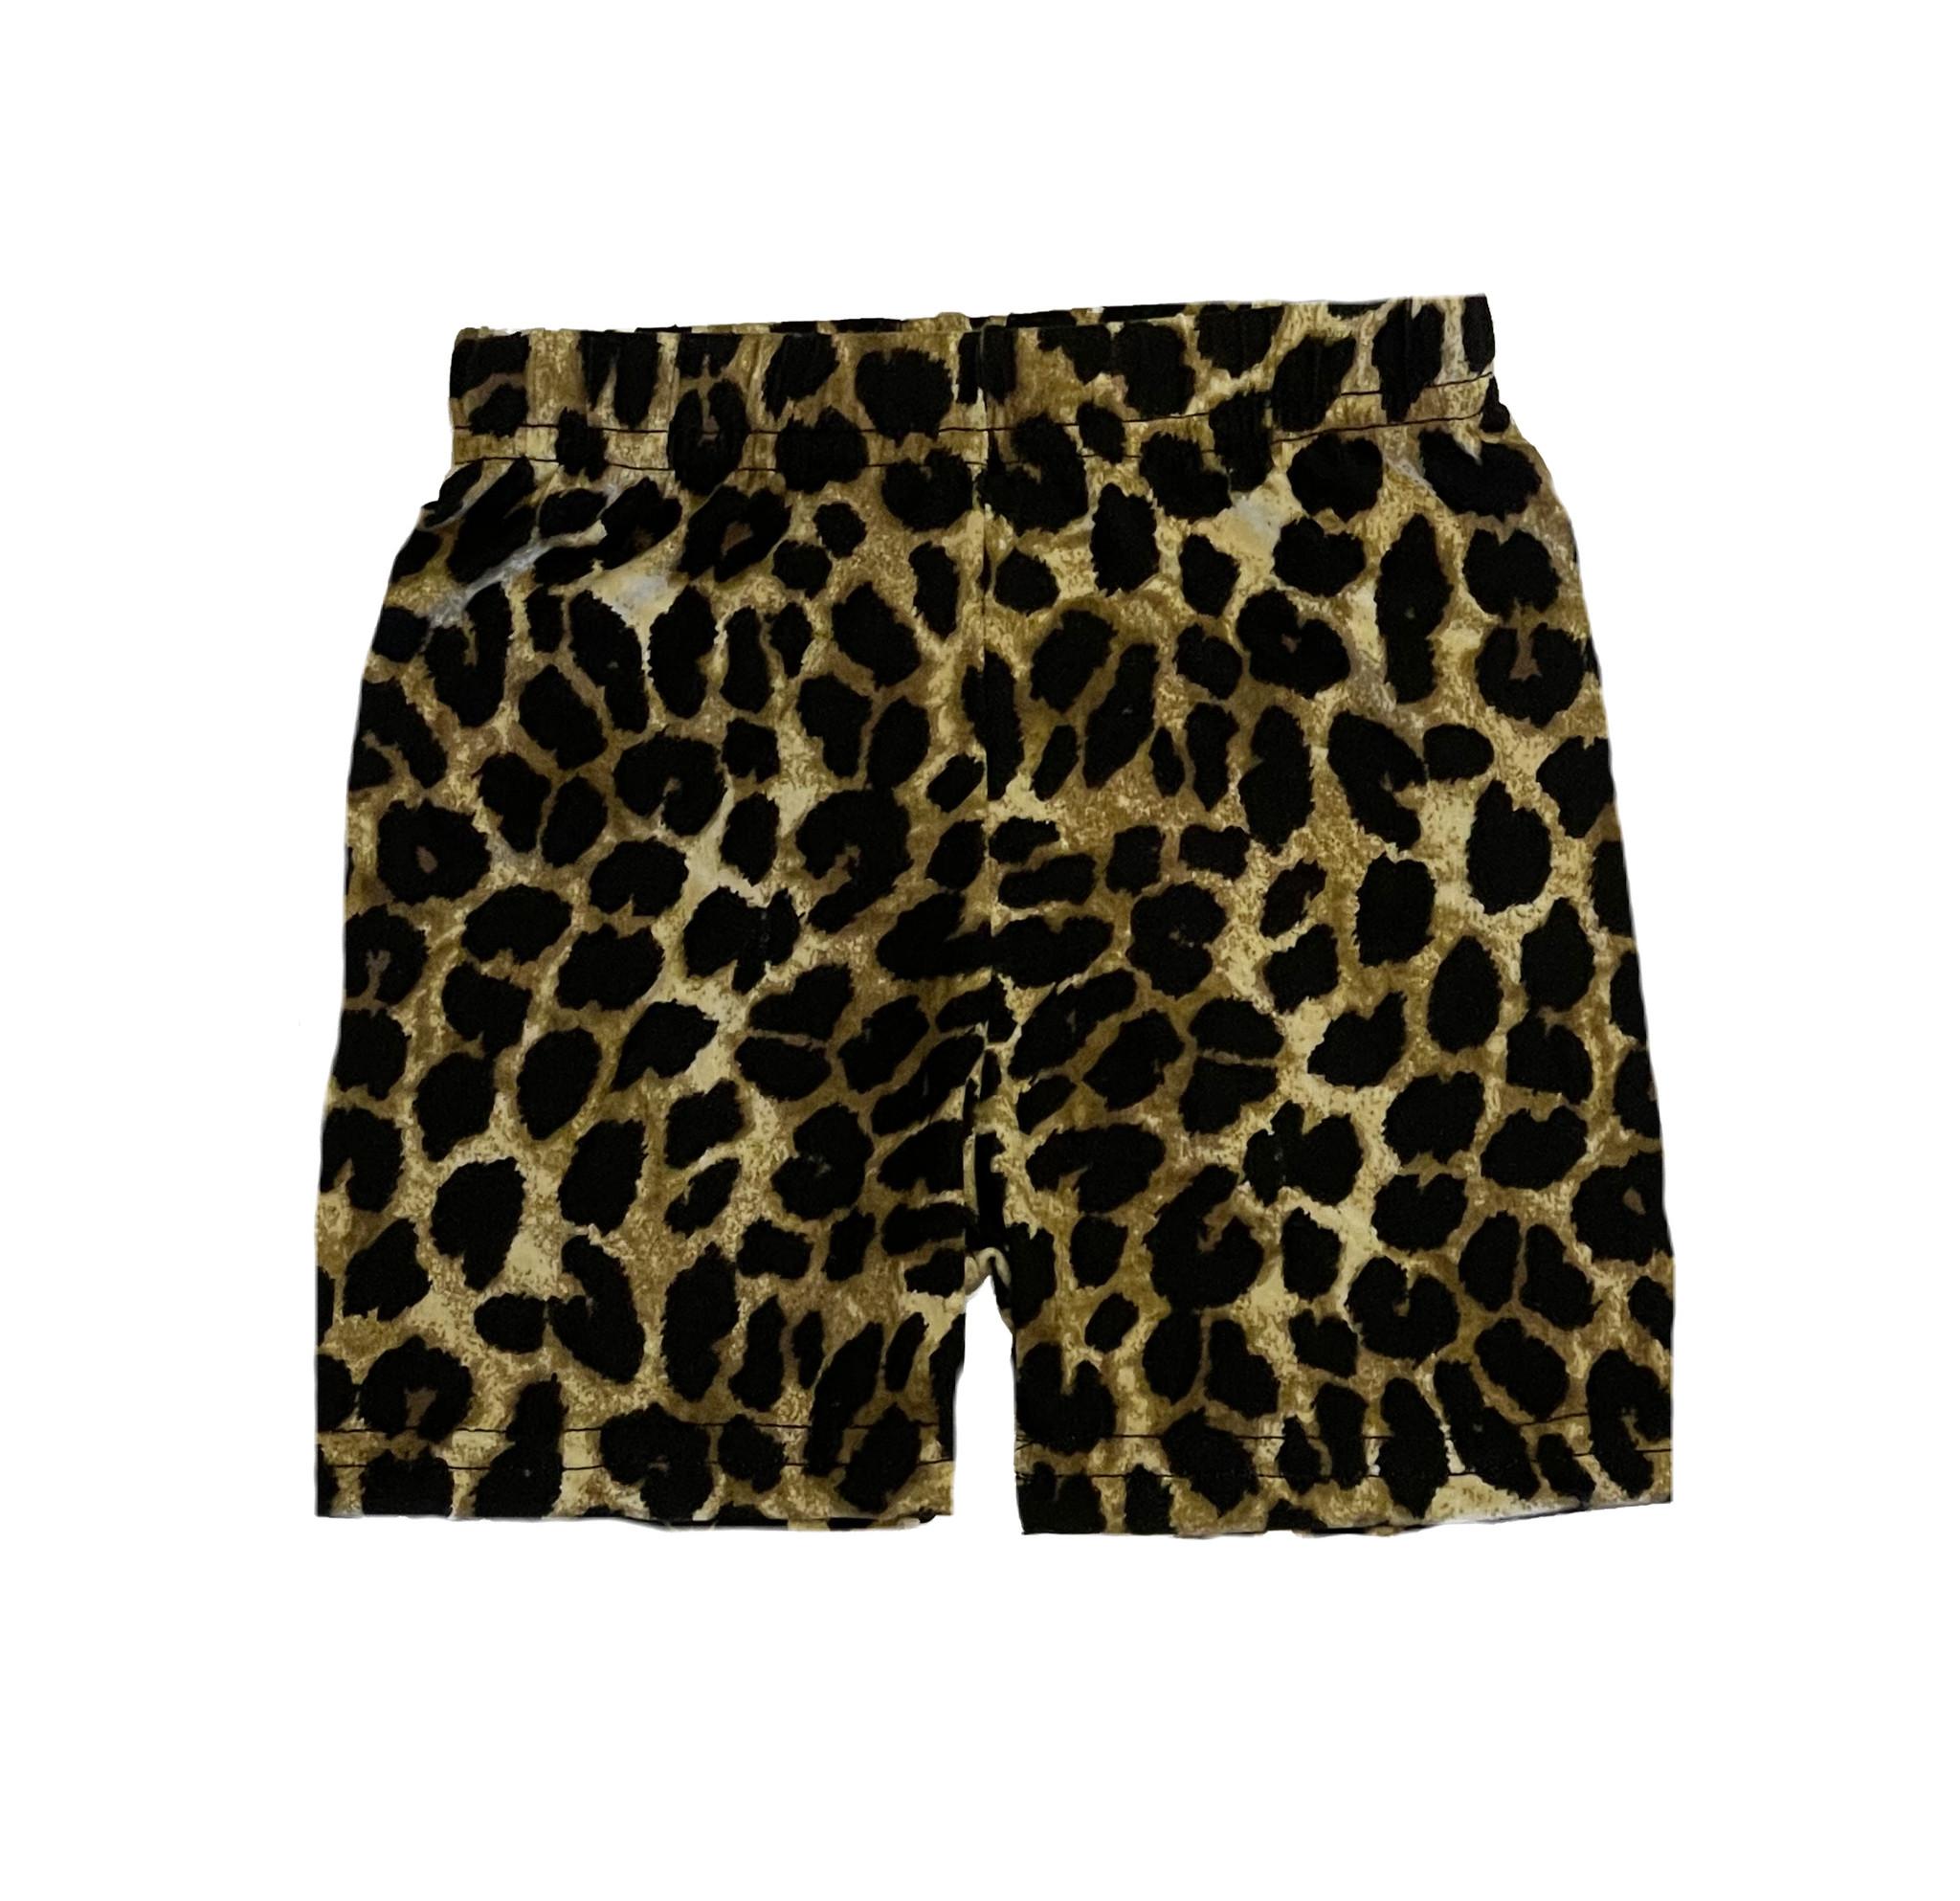 Small Change Soft Leopard Bike Shorts